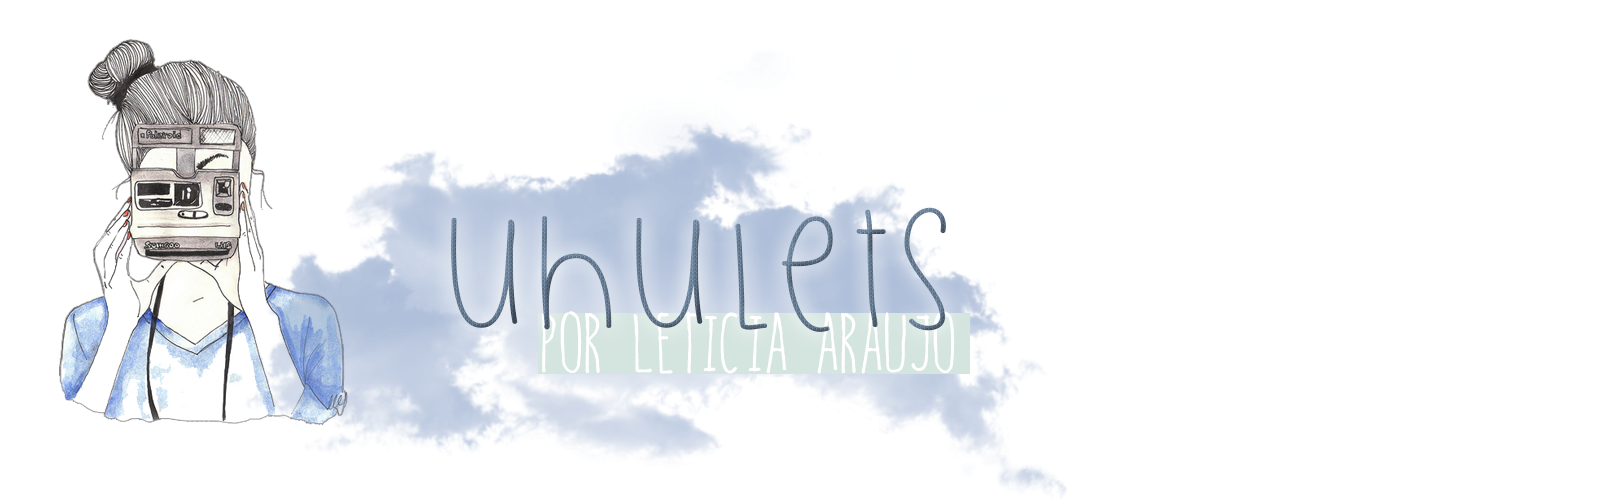 UHULETS!